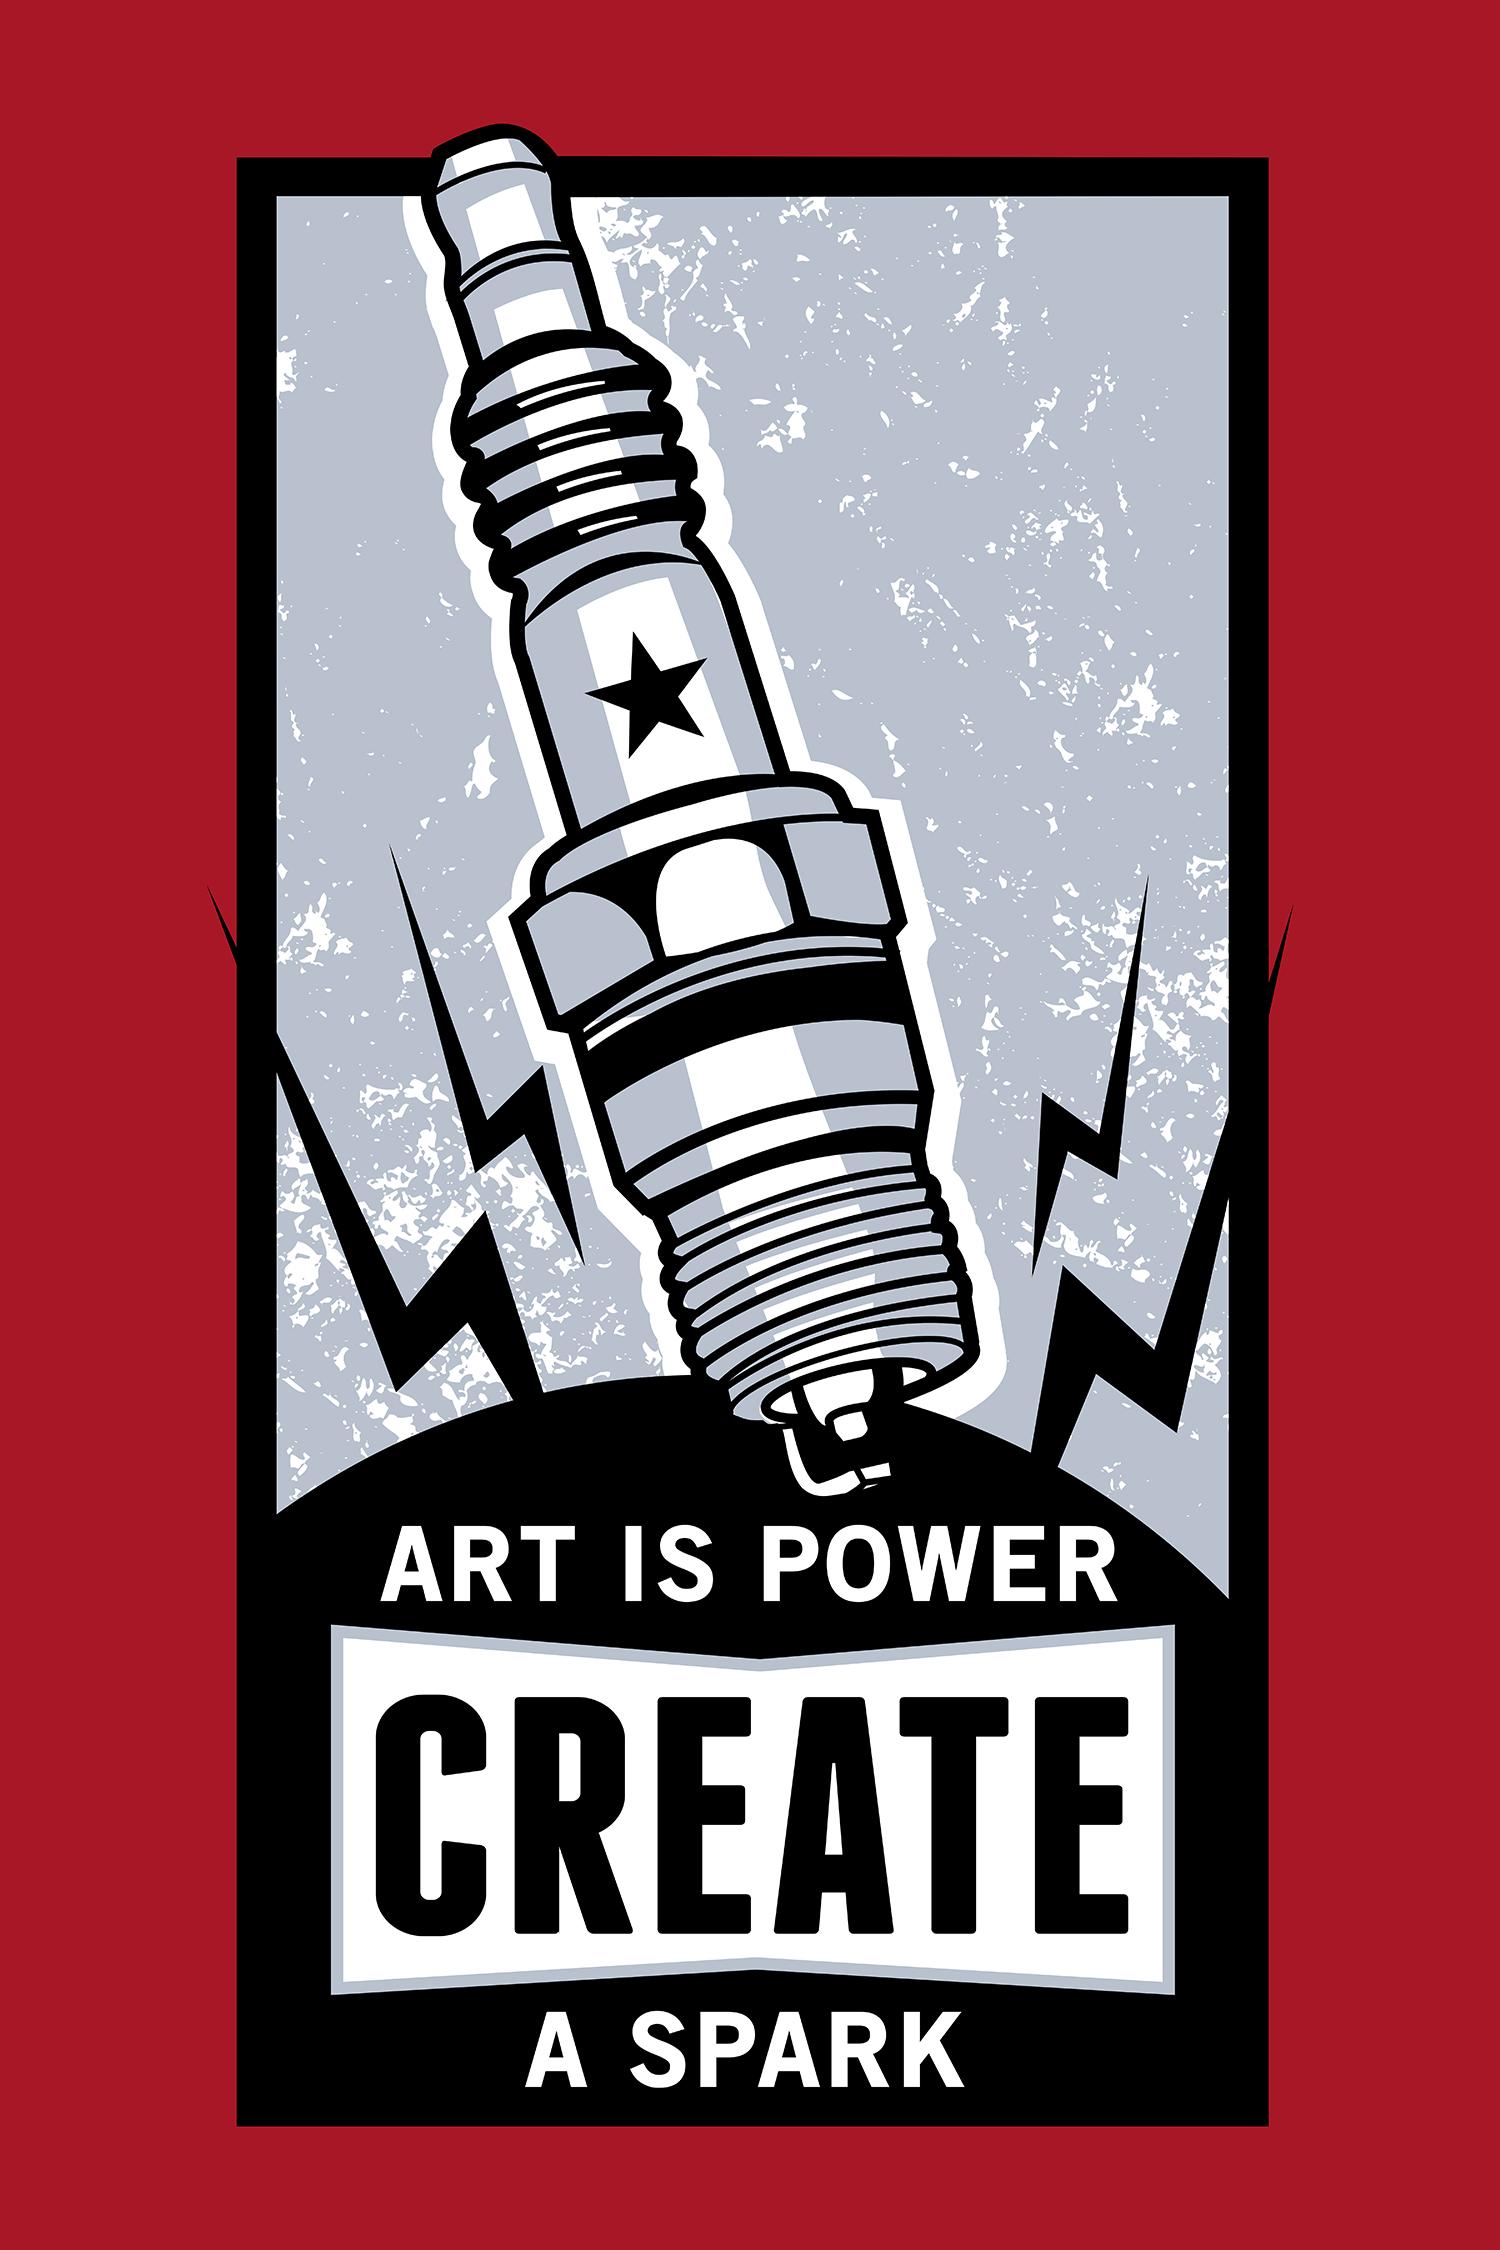 ArtisPower.png